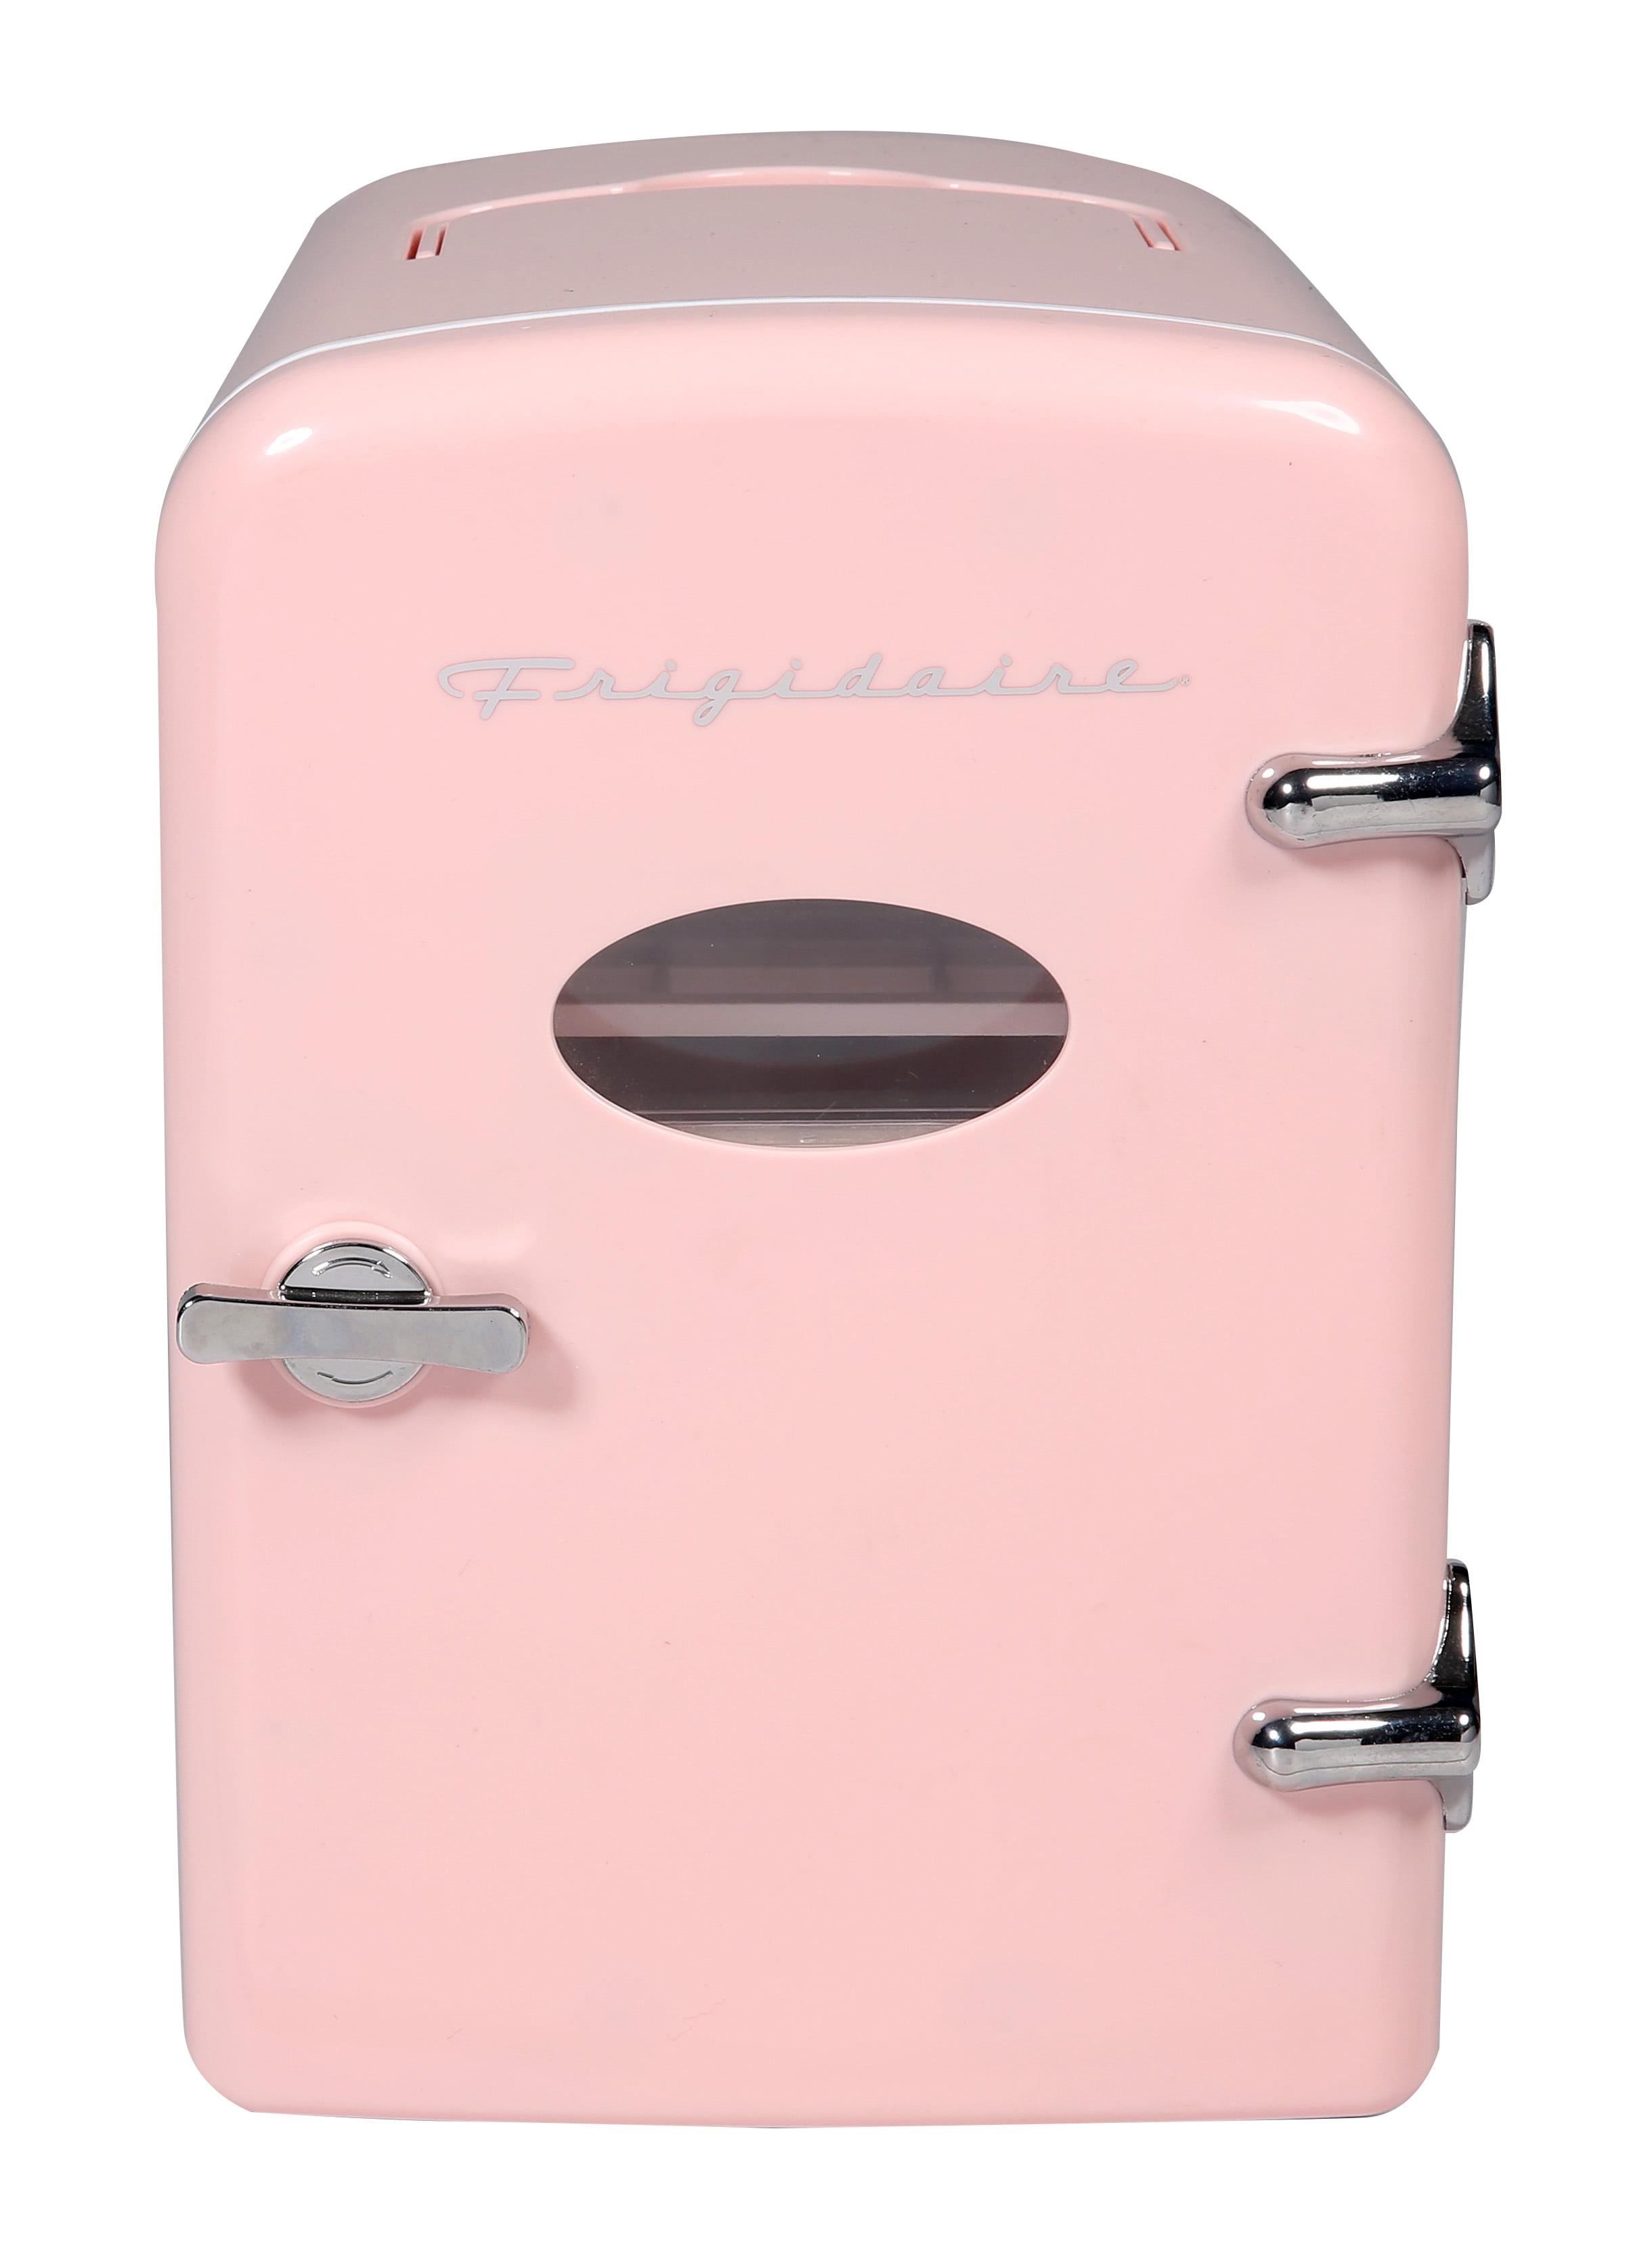 Frigidaire Portable Retro Extra Large 9-Can Mini Fridge EFMIS175, Pink